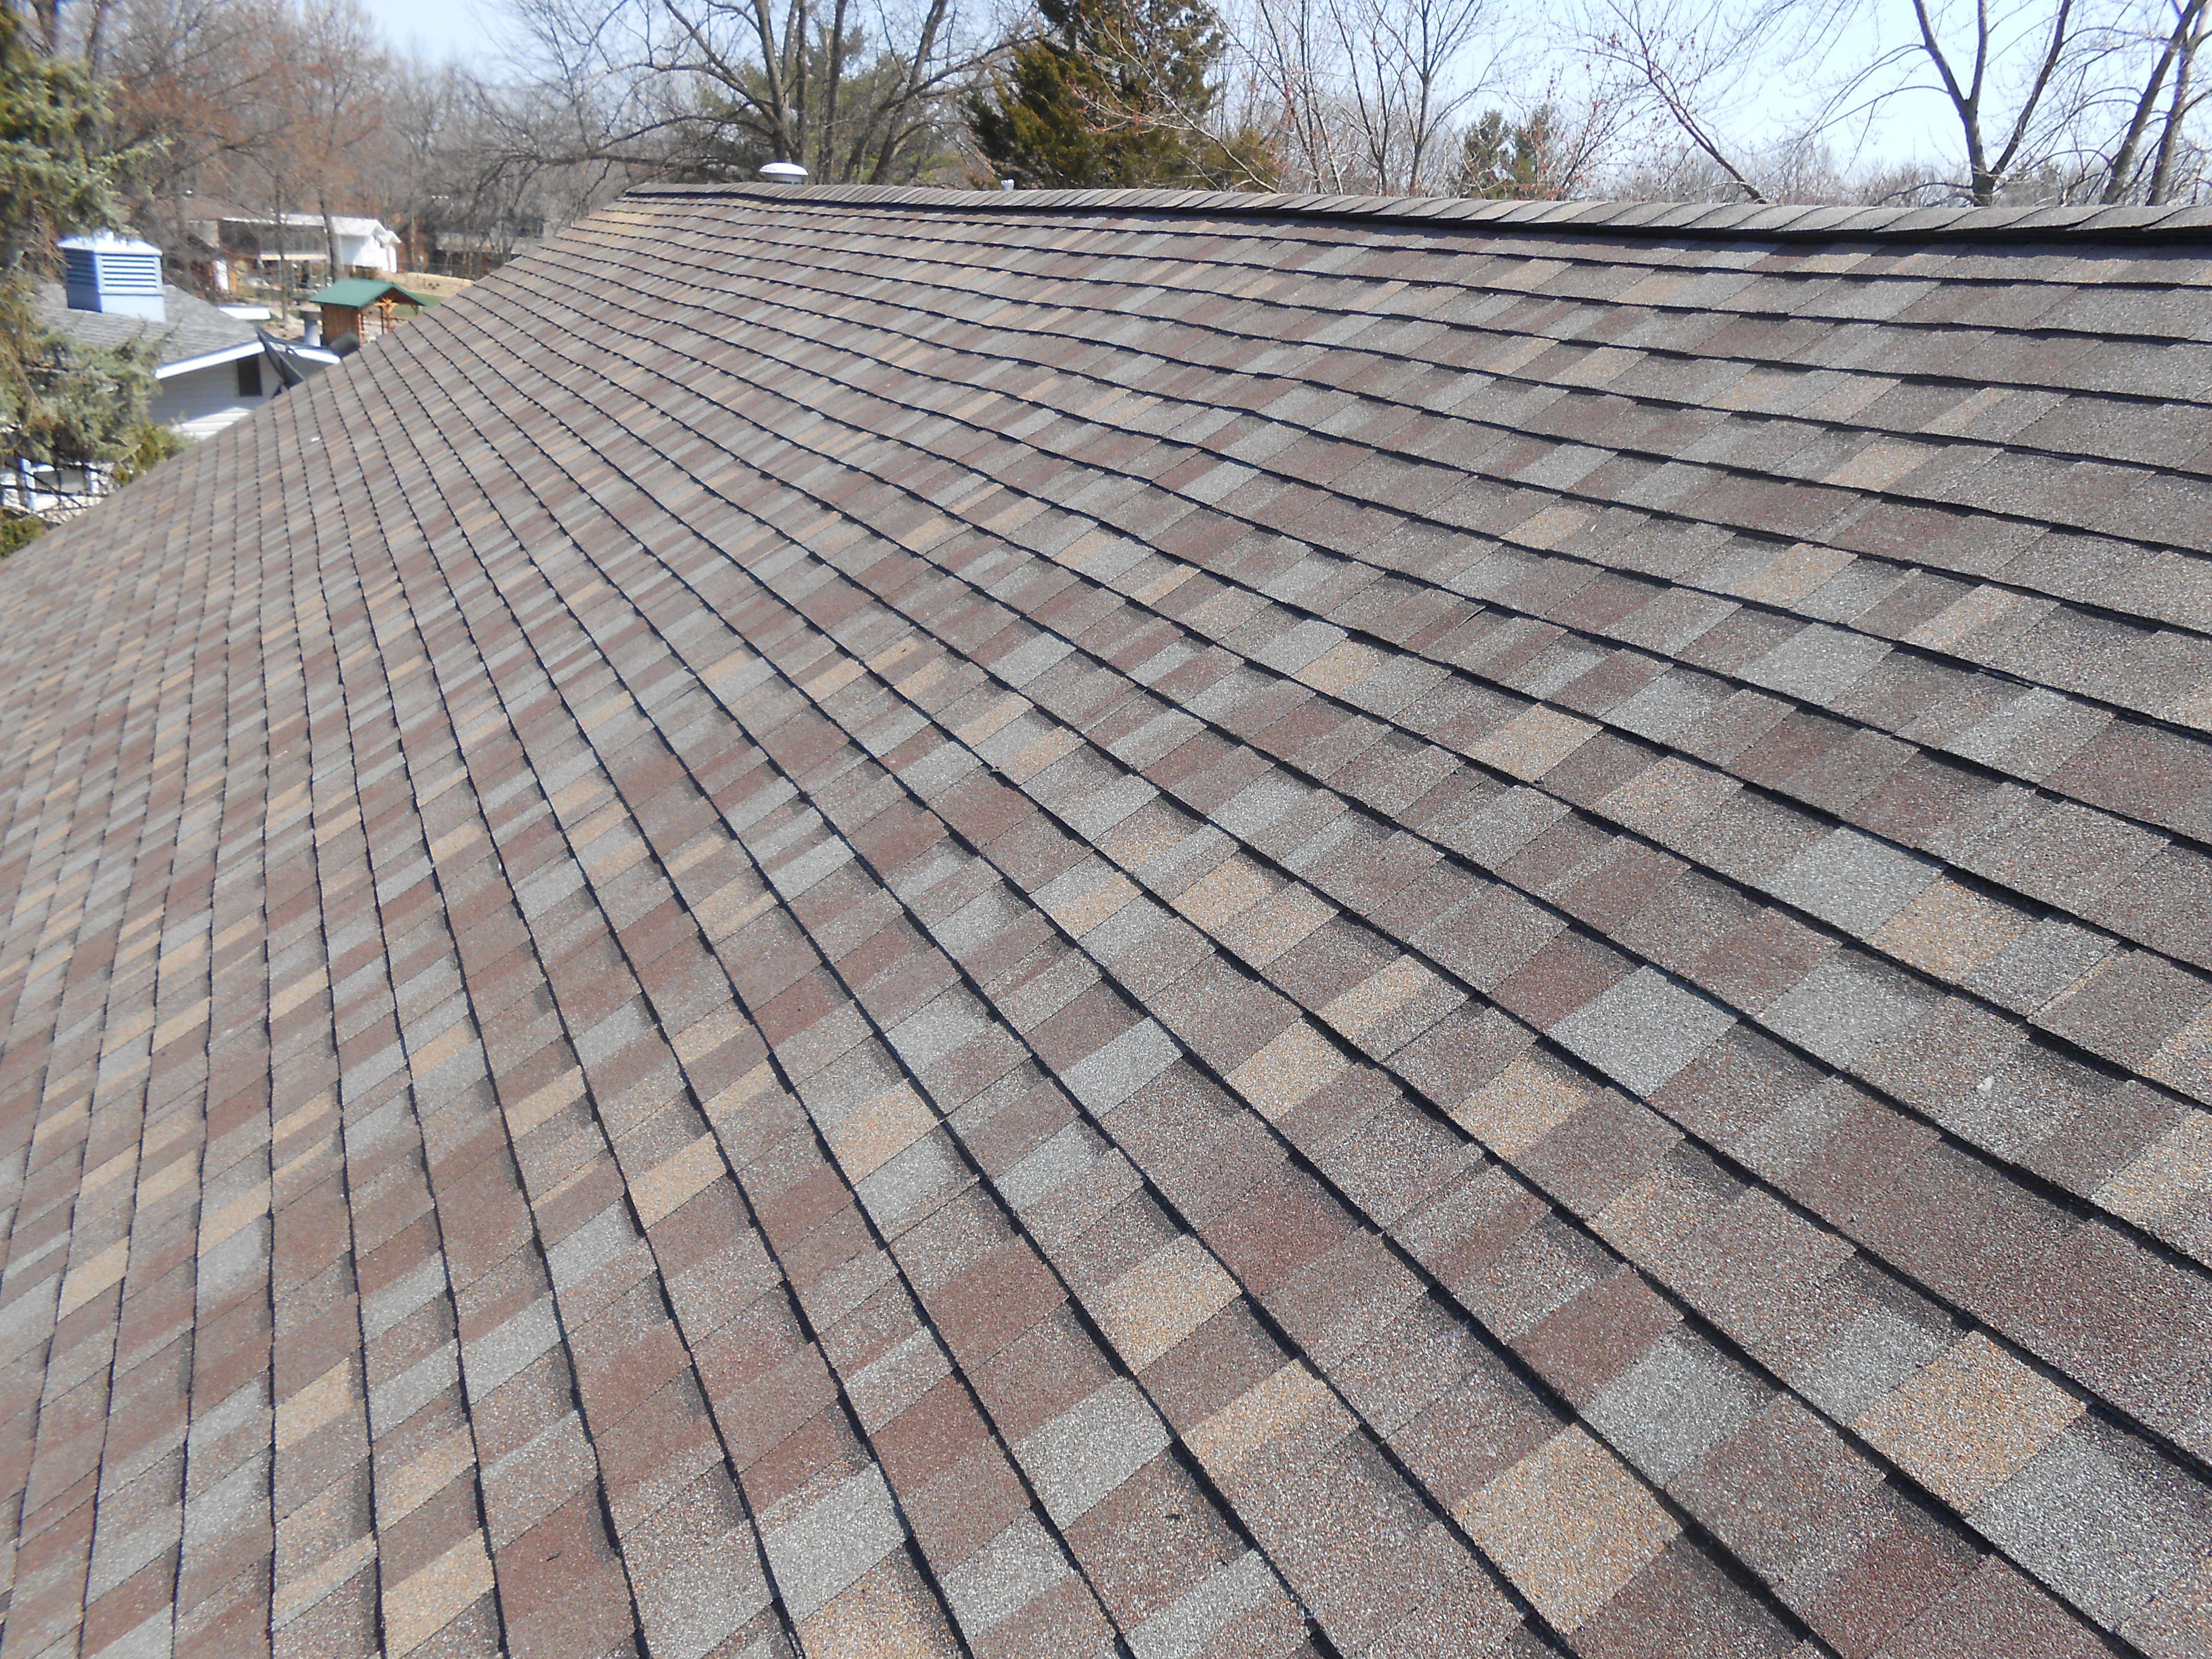 Certainteed Landmark Pro Prairie Wood Certainteed Craftsman Exterior Roof Shingle Colors